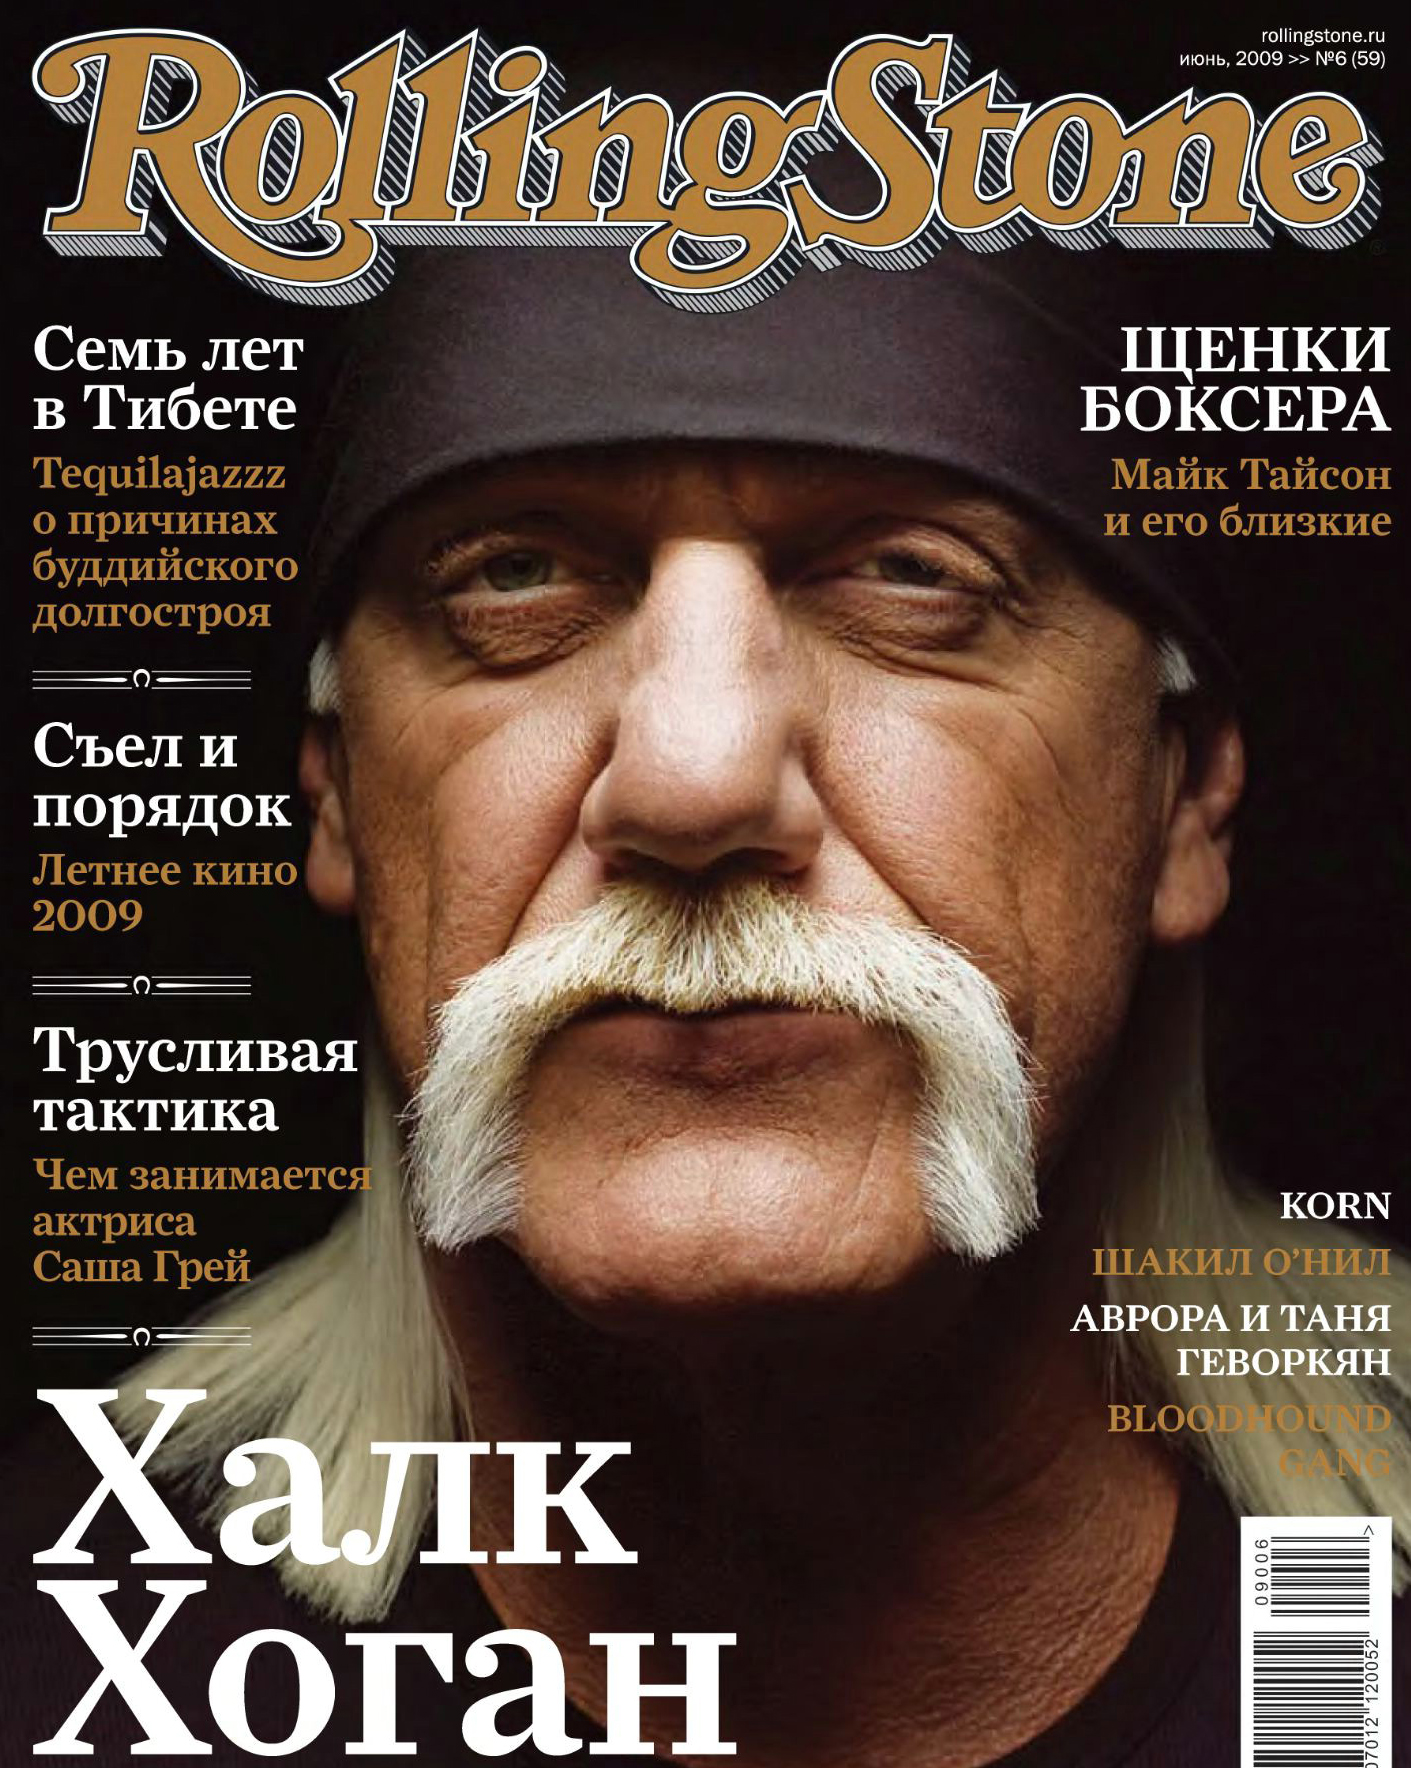 Hulk Hogan photo, pics, wallpaper - photo #